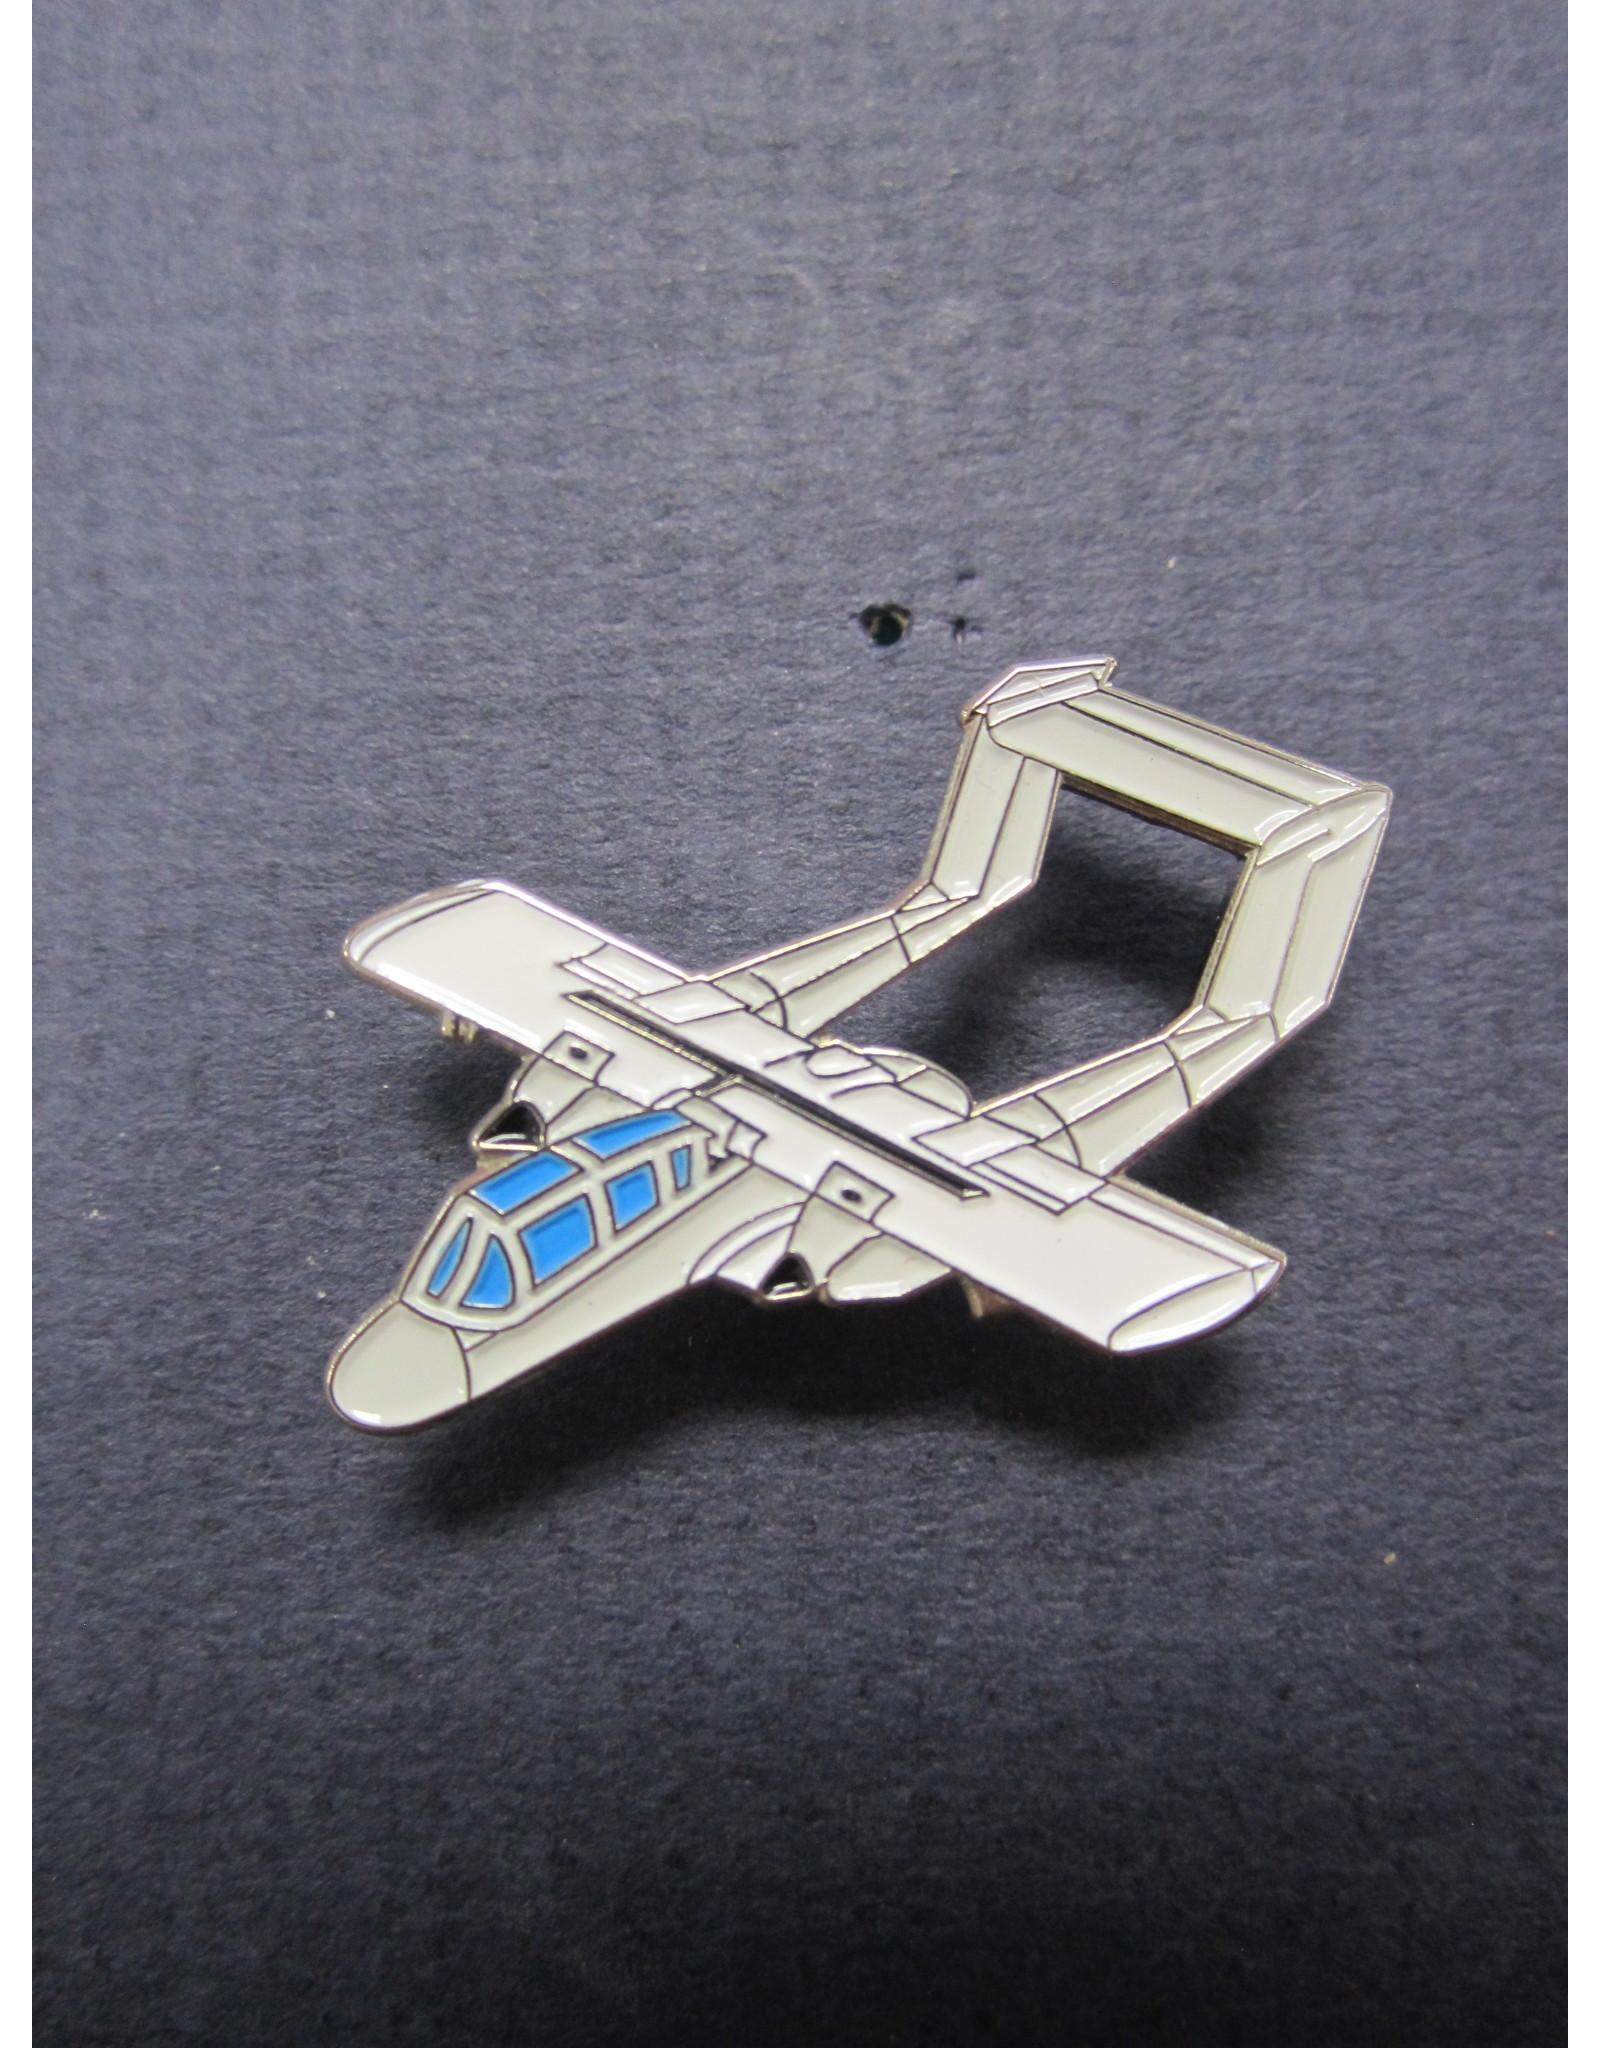 FWAM OV-10A USAF, Pin, gray and white